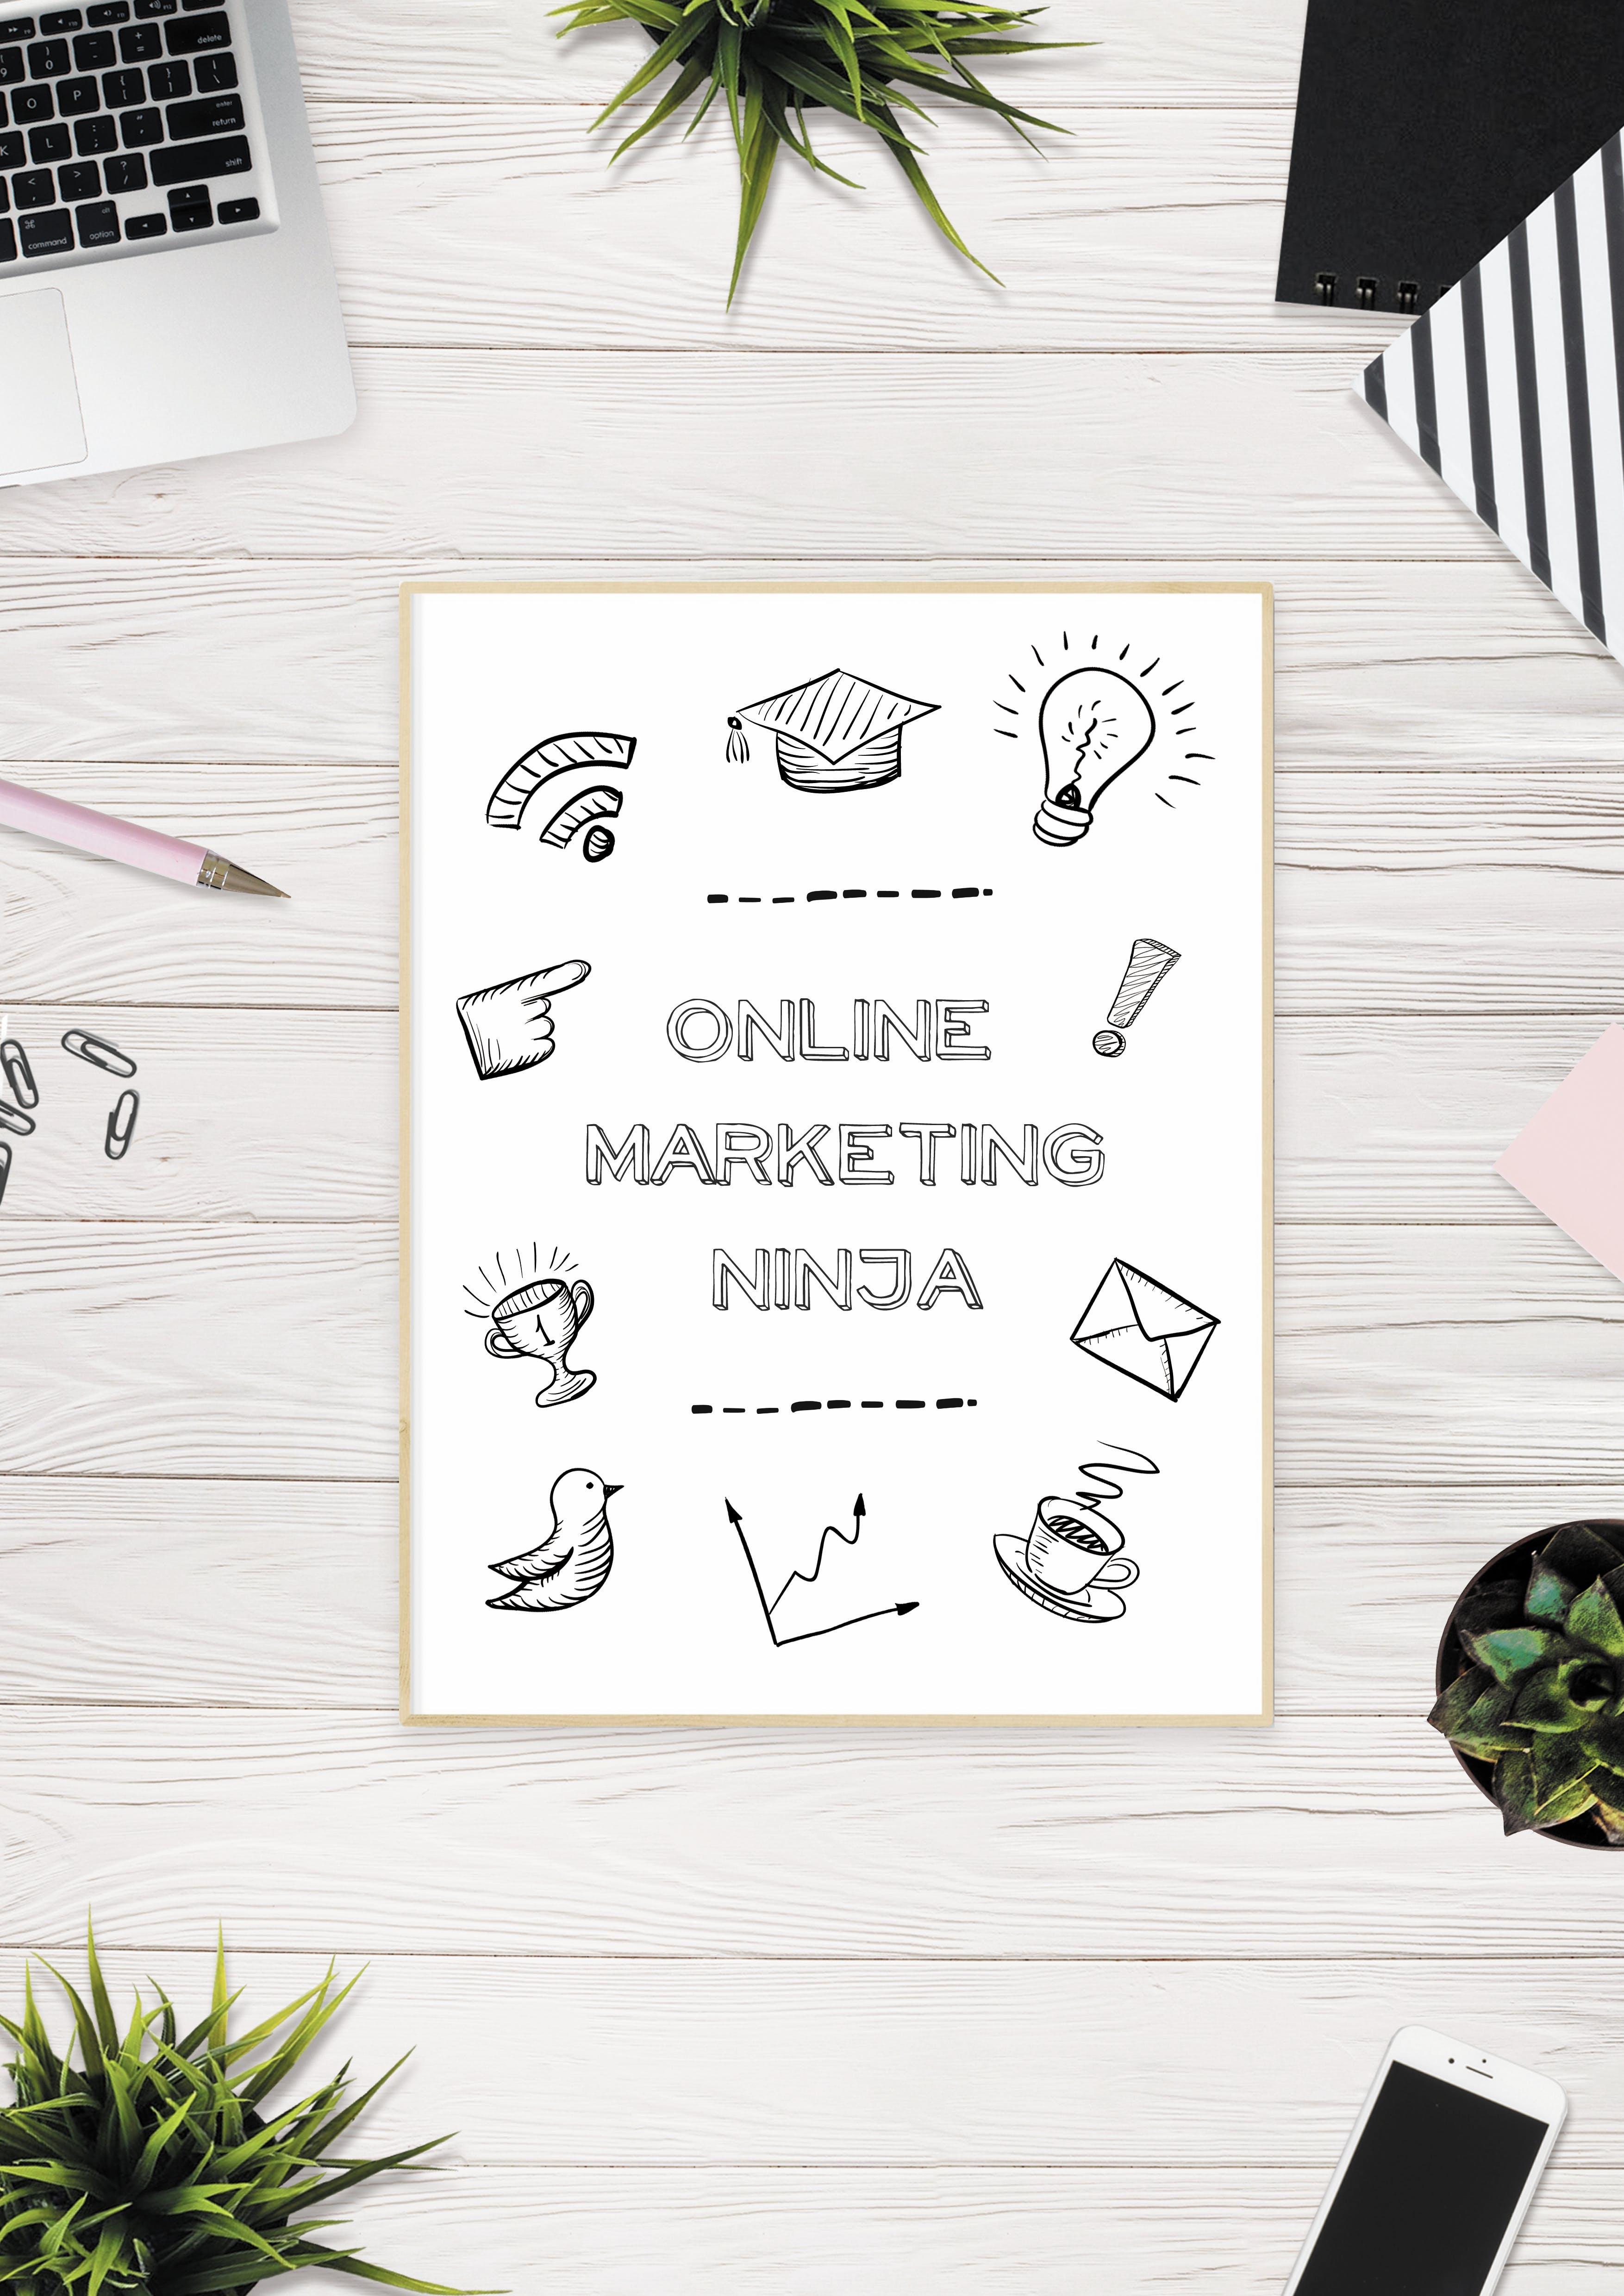 Online Marketing Ninja